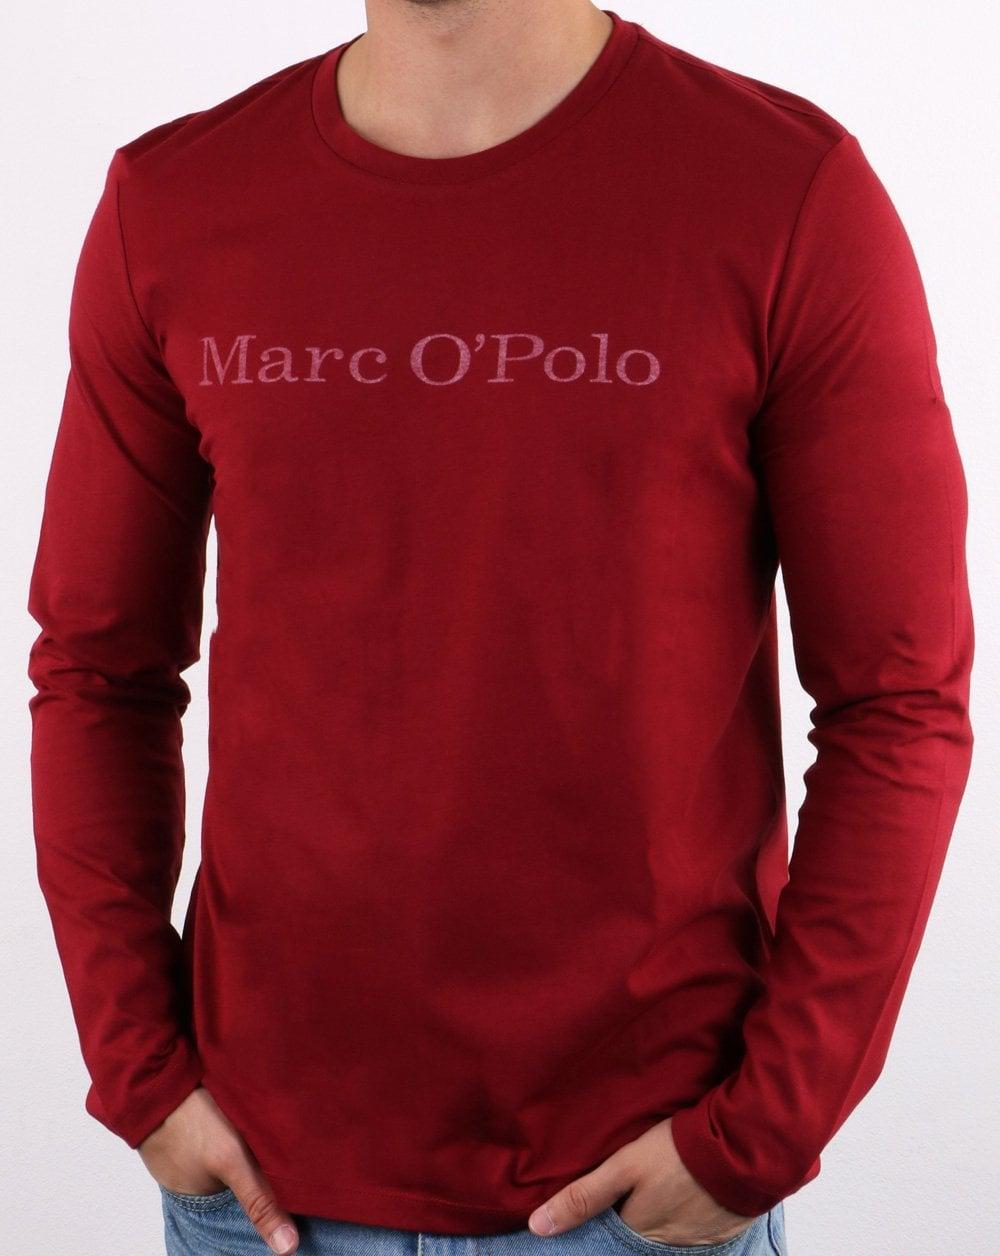 36824423f6 Marc O'Polo Long Sleeve T Shirt in Biking Red | 80s Casual Classics